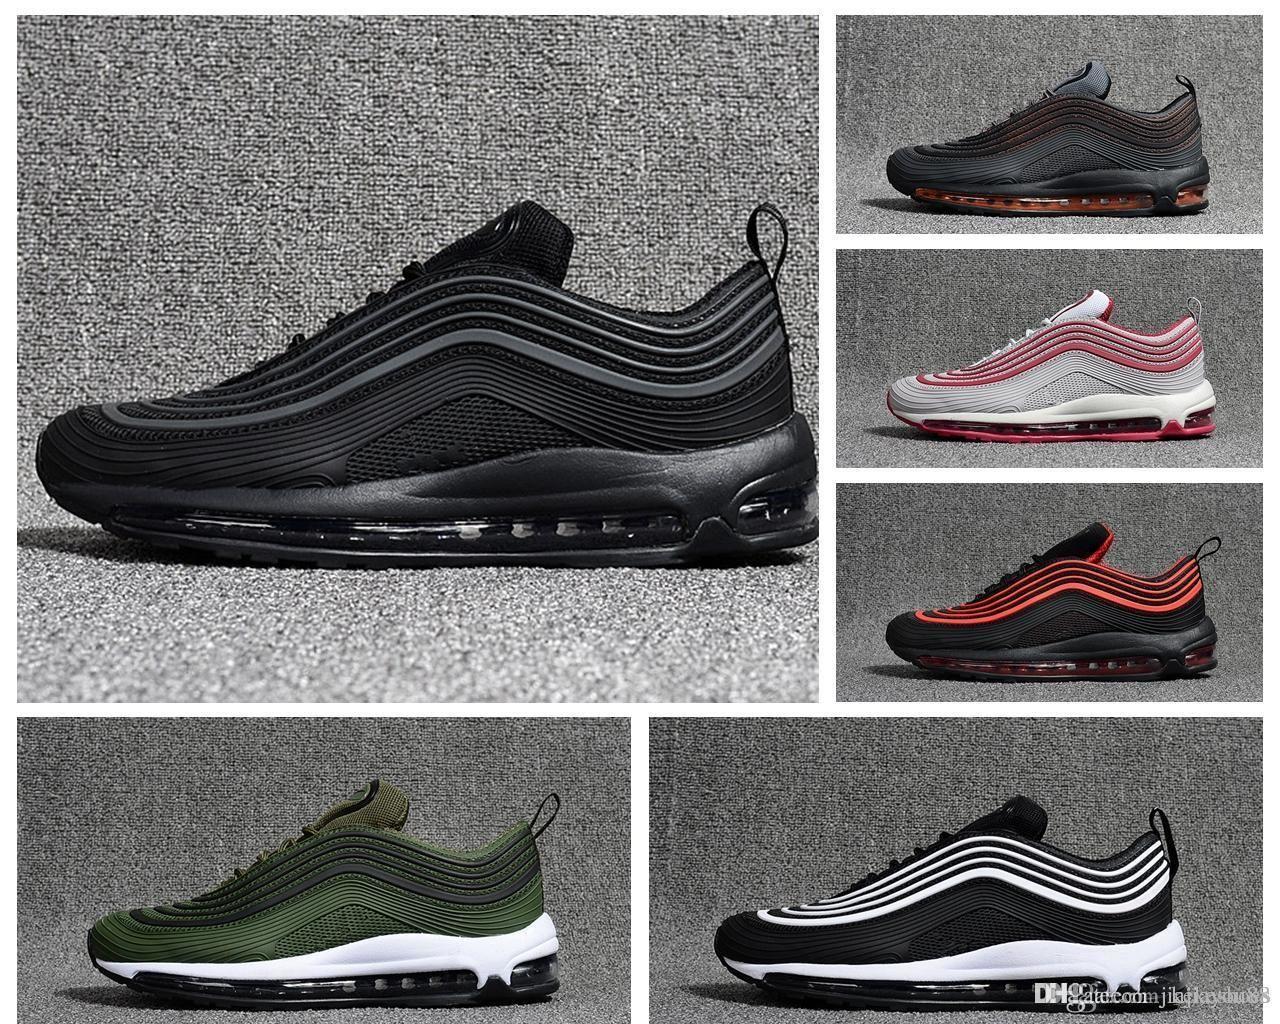 97 Ultra 17 Premium Triple Black Seven premium Silver Black Silver Bullet WHITE 3M Premium Running Shoes With Box Men Women free shipping